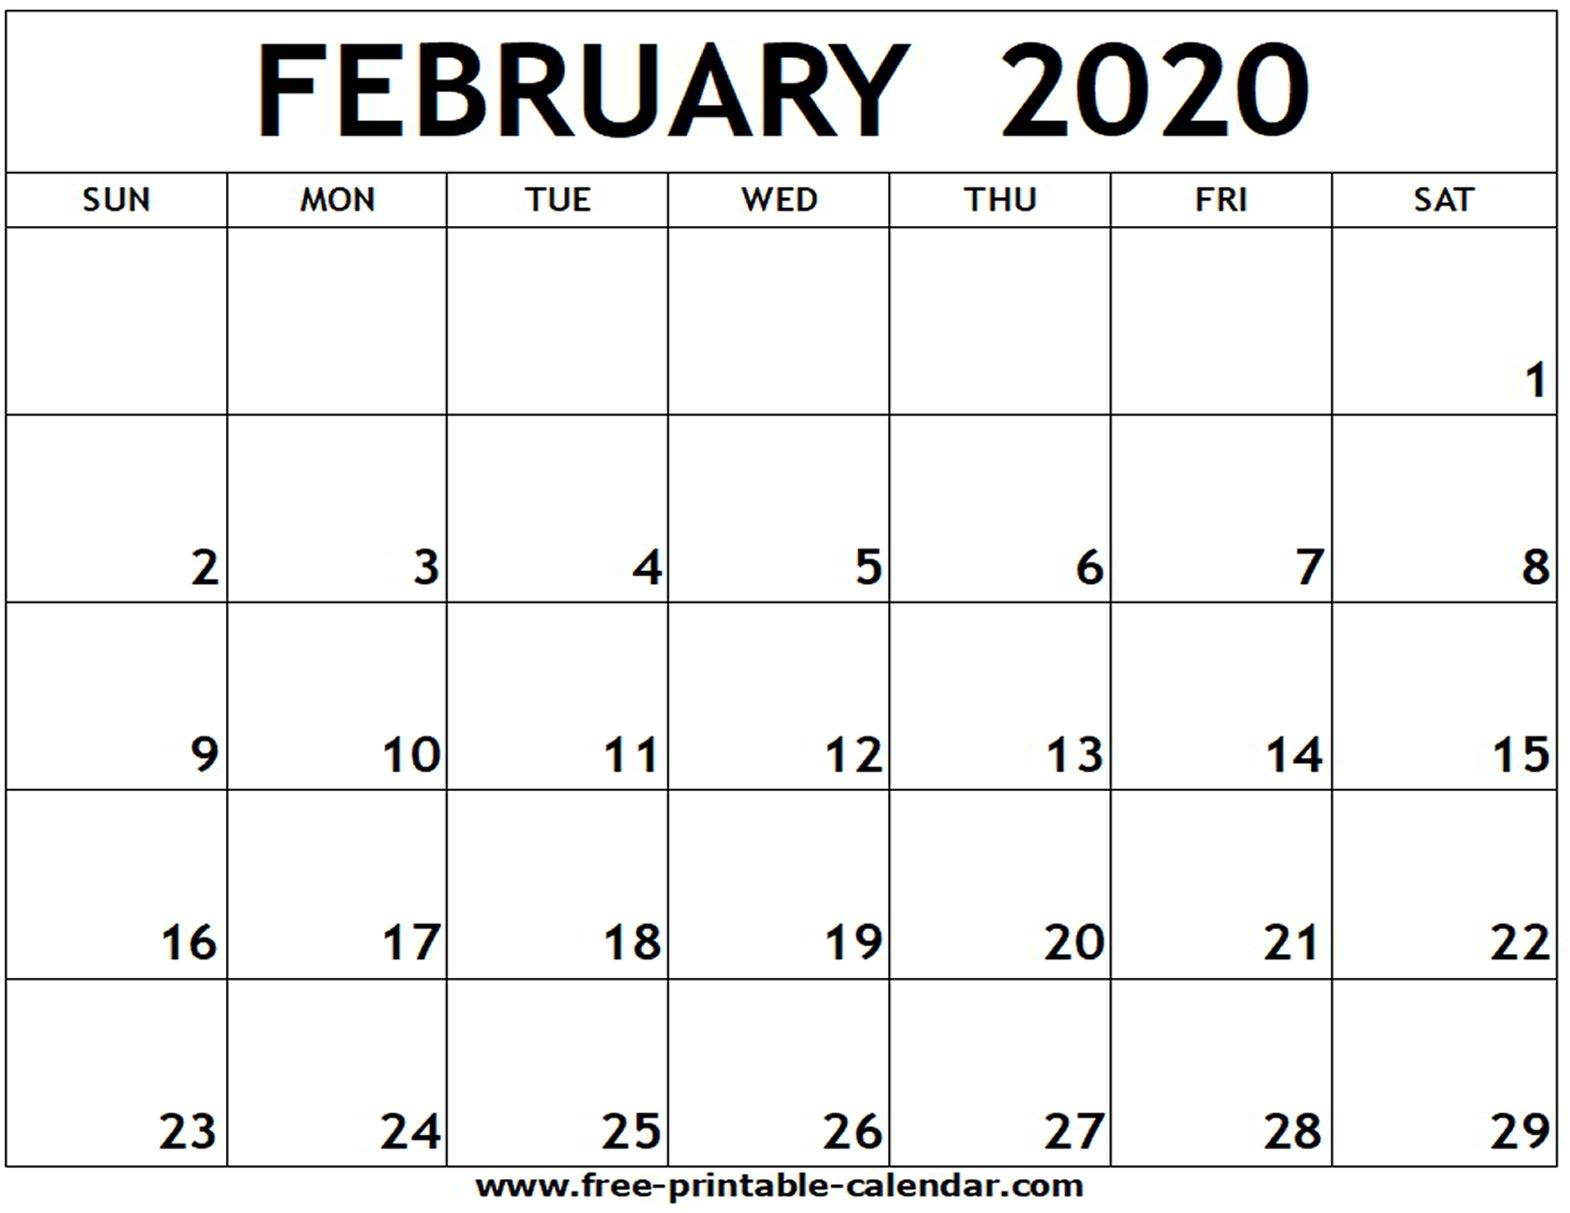 February 2020 Printable Calendar - Free-Printable-Calendar  Feb 2020 Calendar